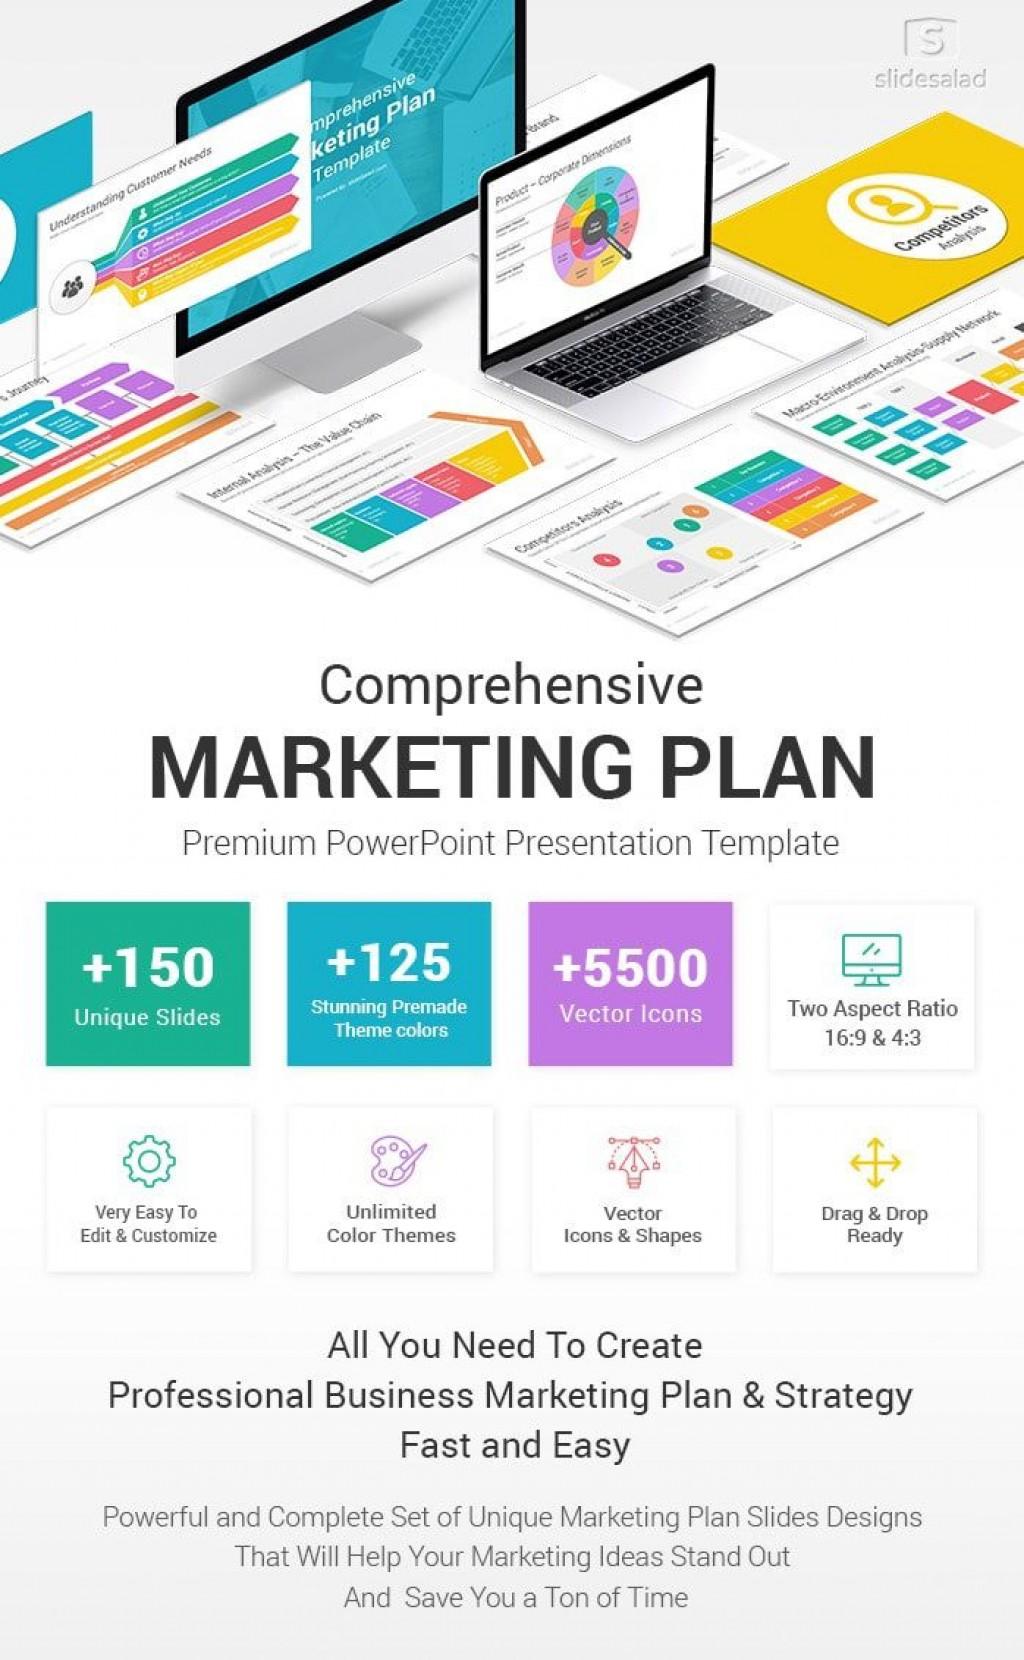 008 Outstanding Digital Marketing Plan Ppt Presentation High Def Large